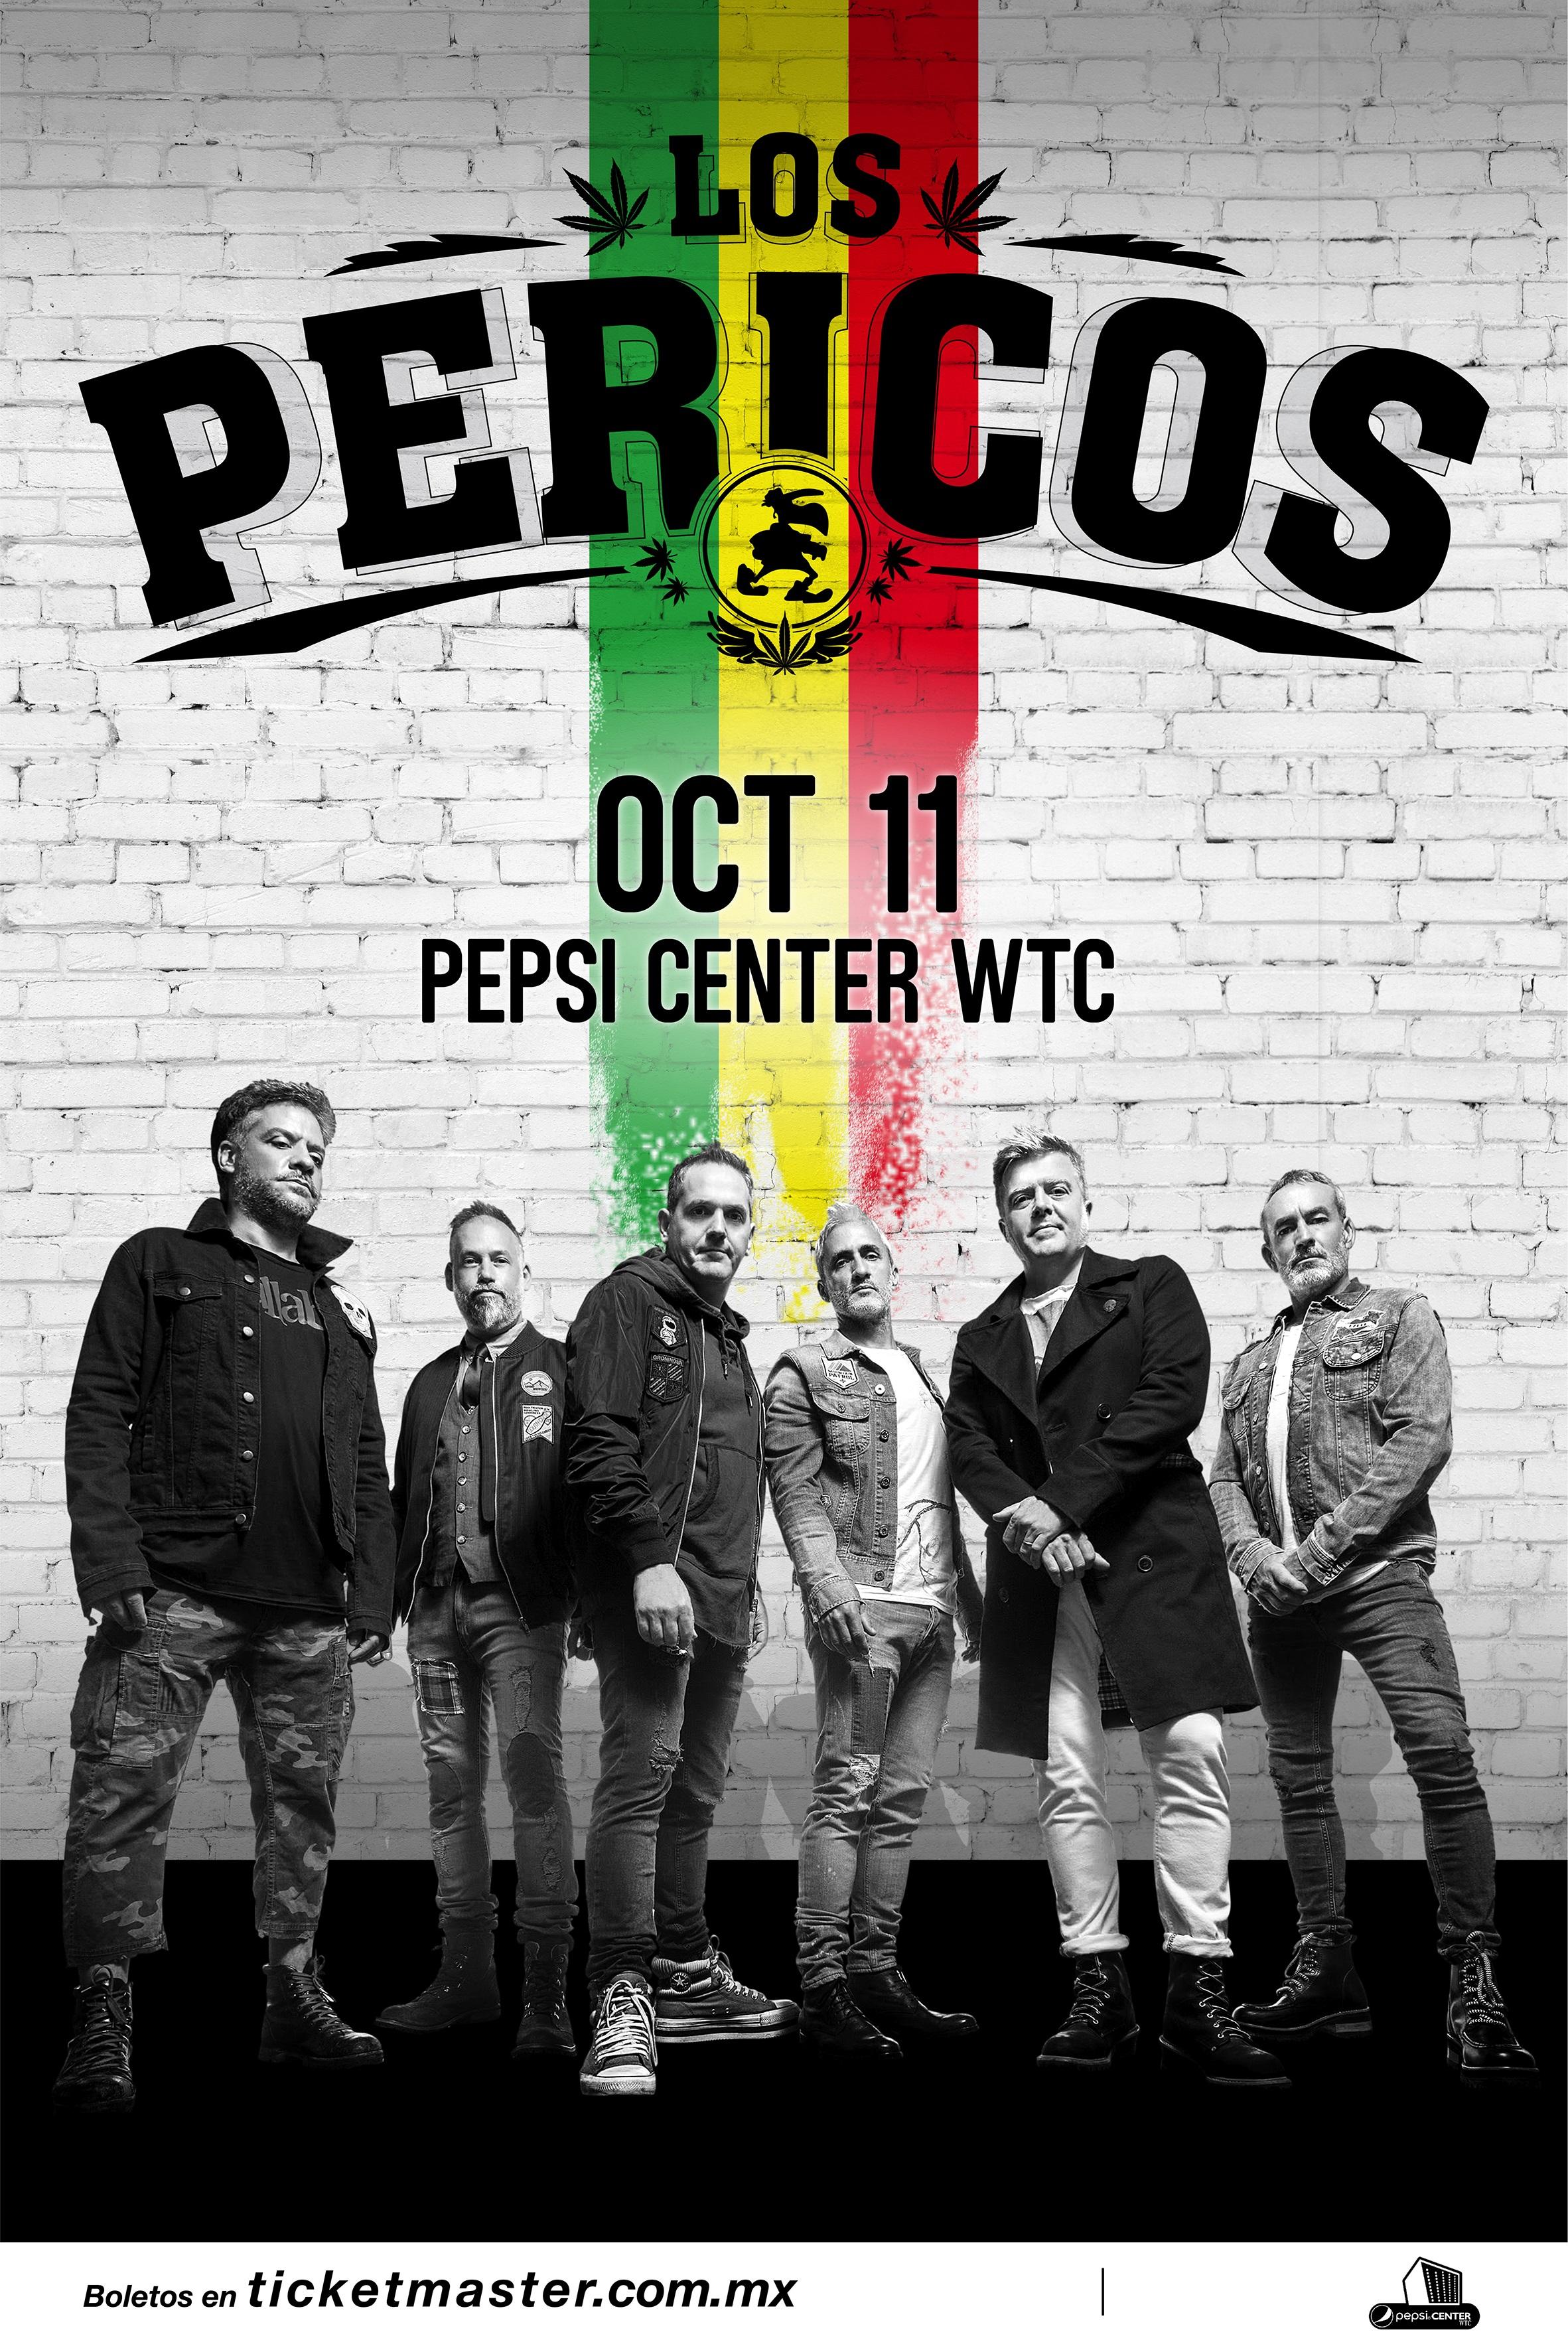 Los Pericos (Pepsi Centyer WTC).jpg